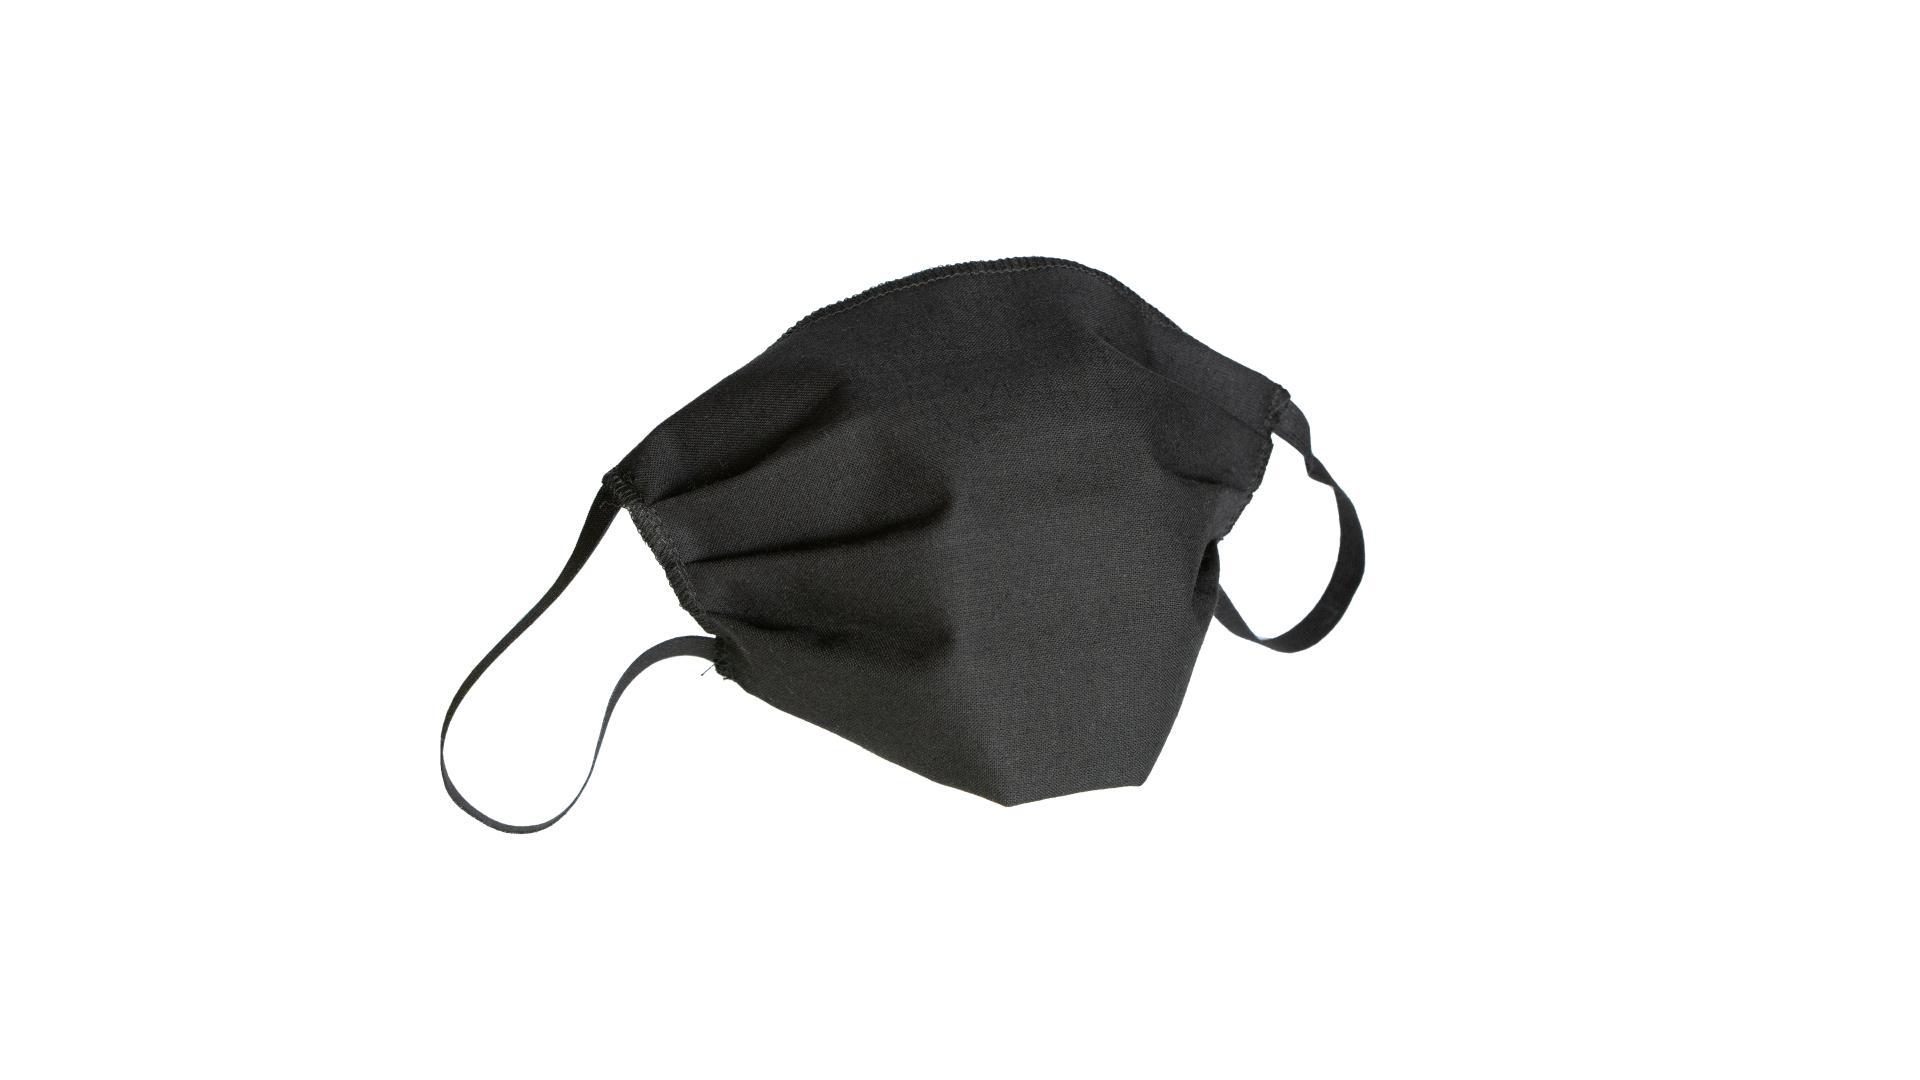 4CARS Dvouvrstvé ochranné bavlněné rouško černé bez vzoru s gumičkou 1ks